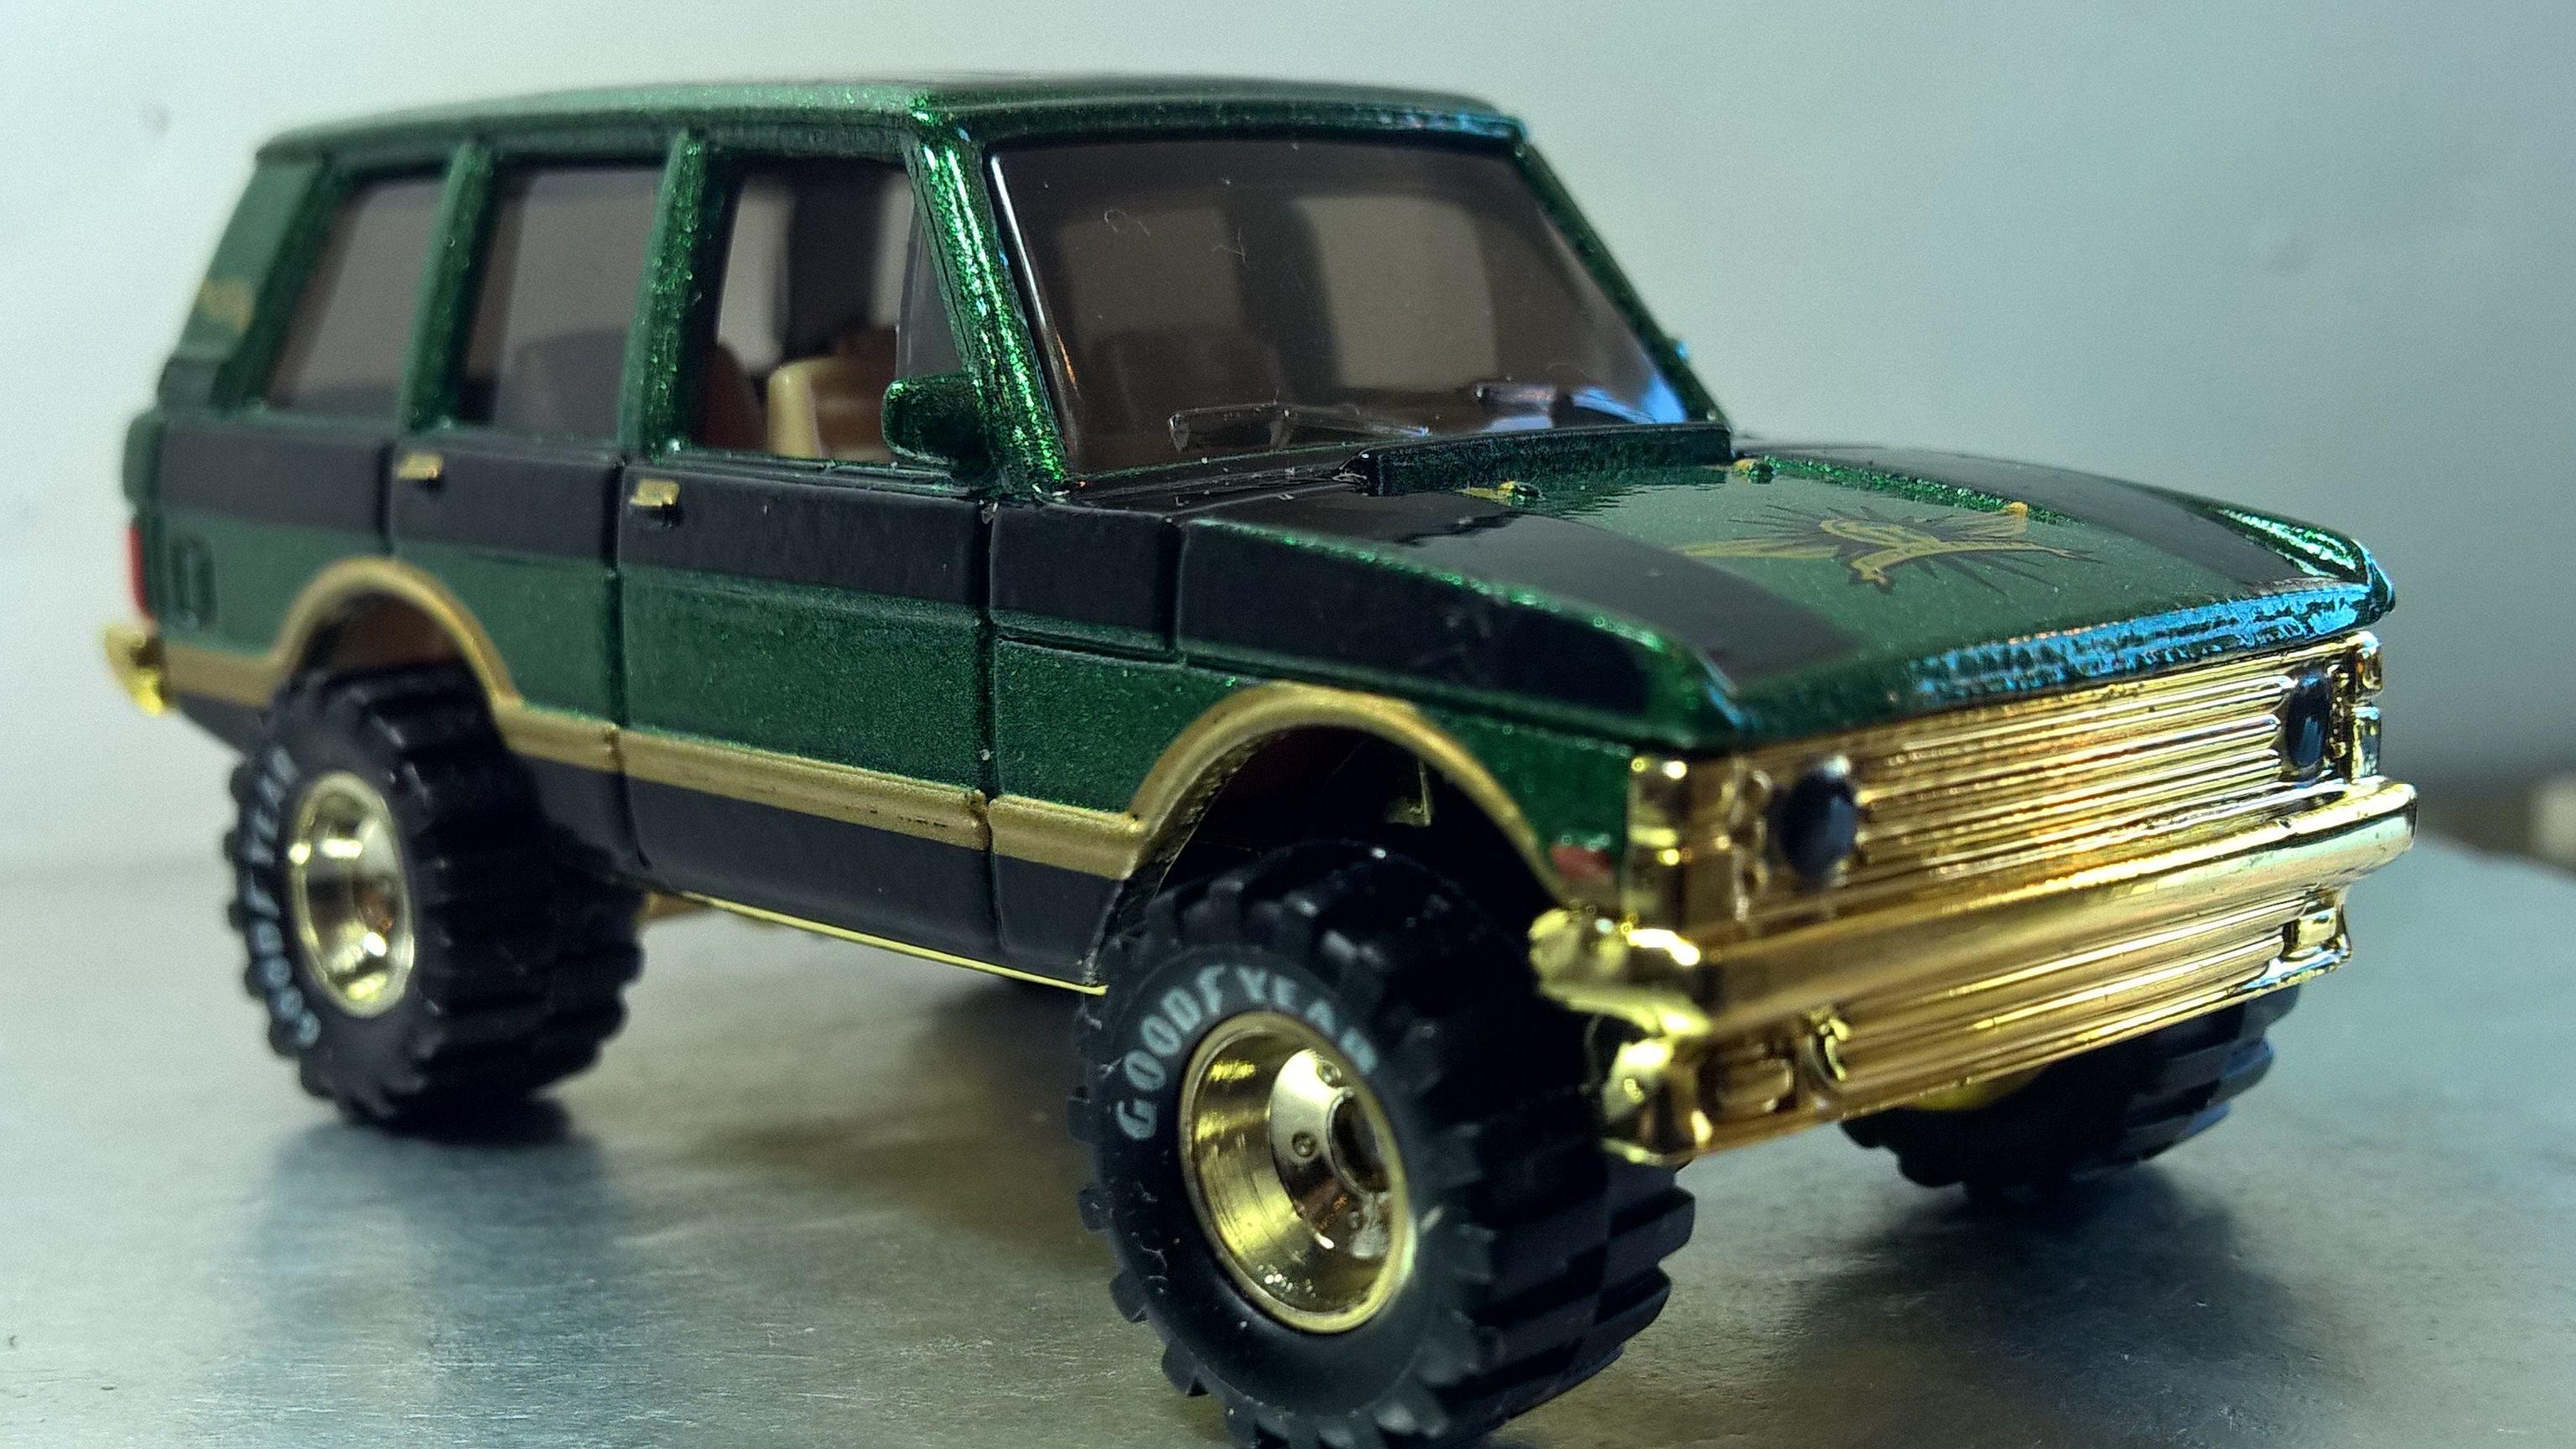 hot wheels range rover final run 1999 [ 3072 x 1728 Pixel ]